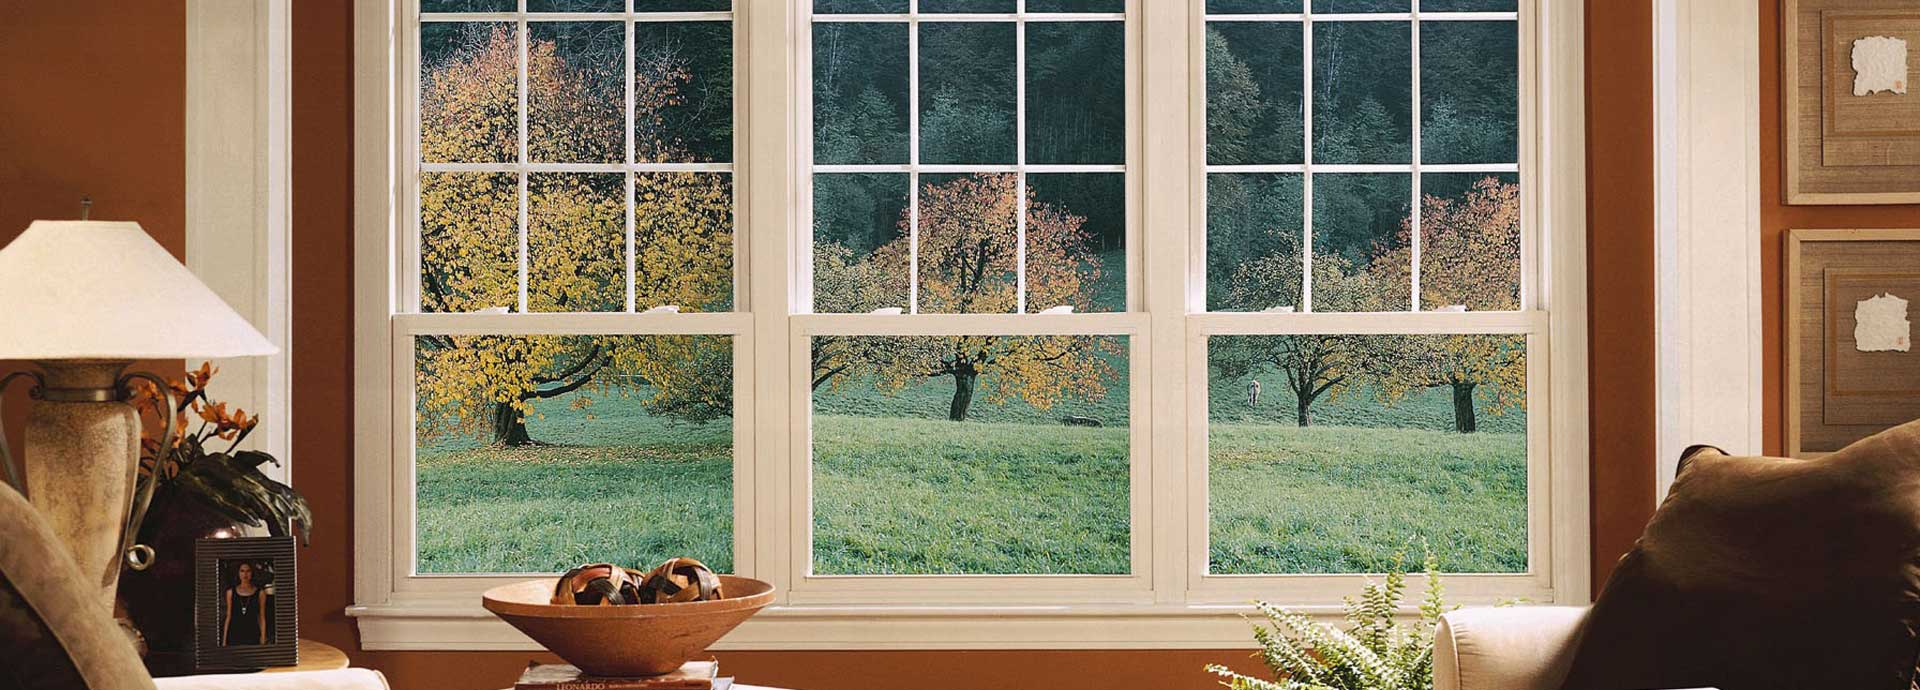 Vinyl window consumer reviews vinyl replacement windows for Replacement windows reviews